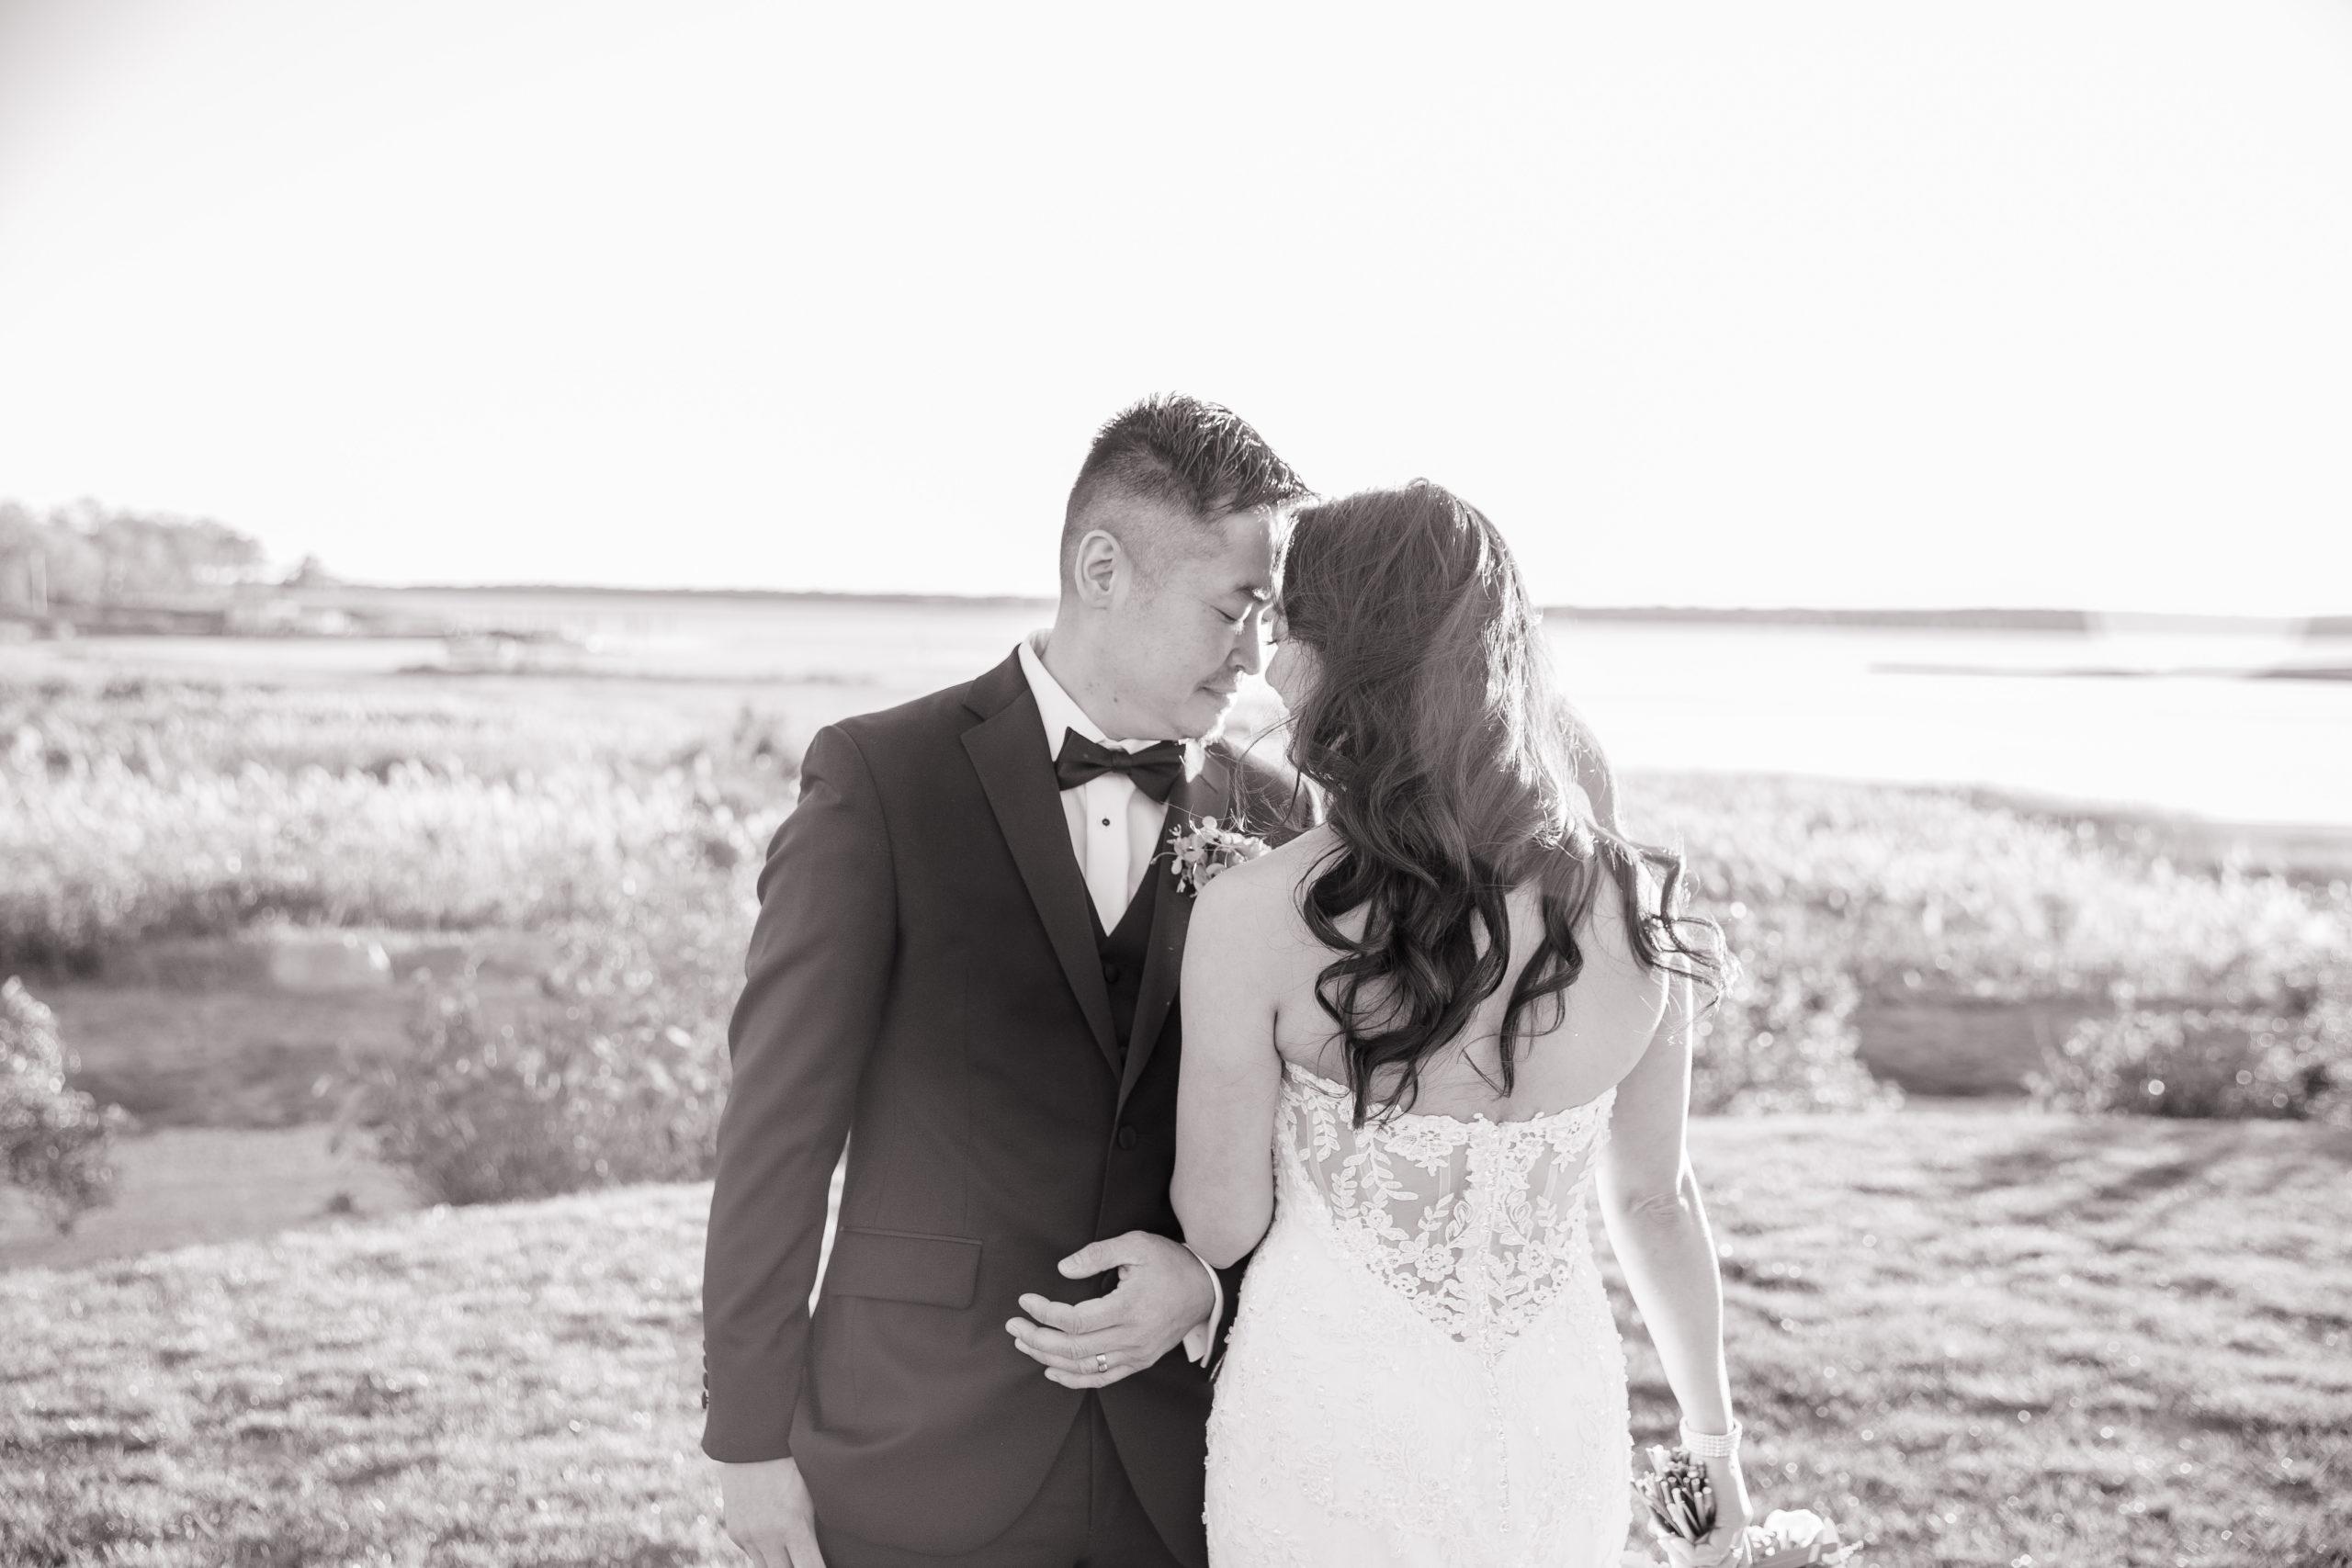 Harbor lights, warwick, rhode island, RI, Tracy Jenkins Photography, RI wedding photographer, Rhode Island wedding photographer, micro-wedding, couple photos, bride, groom